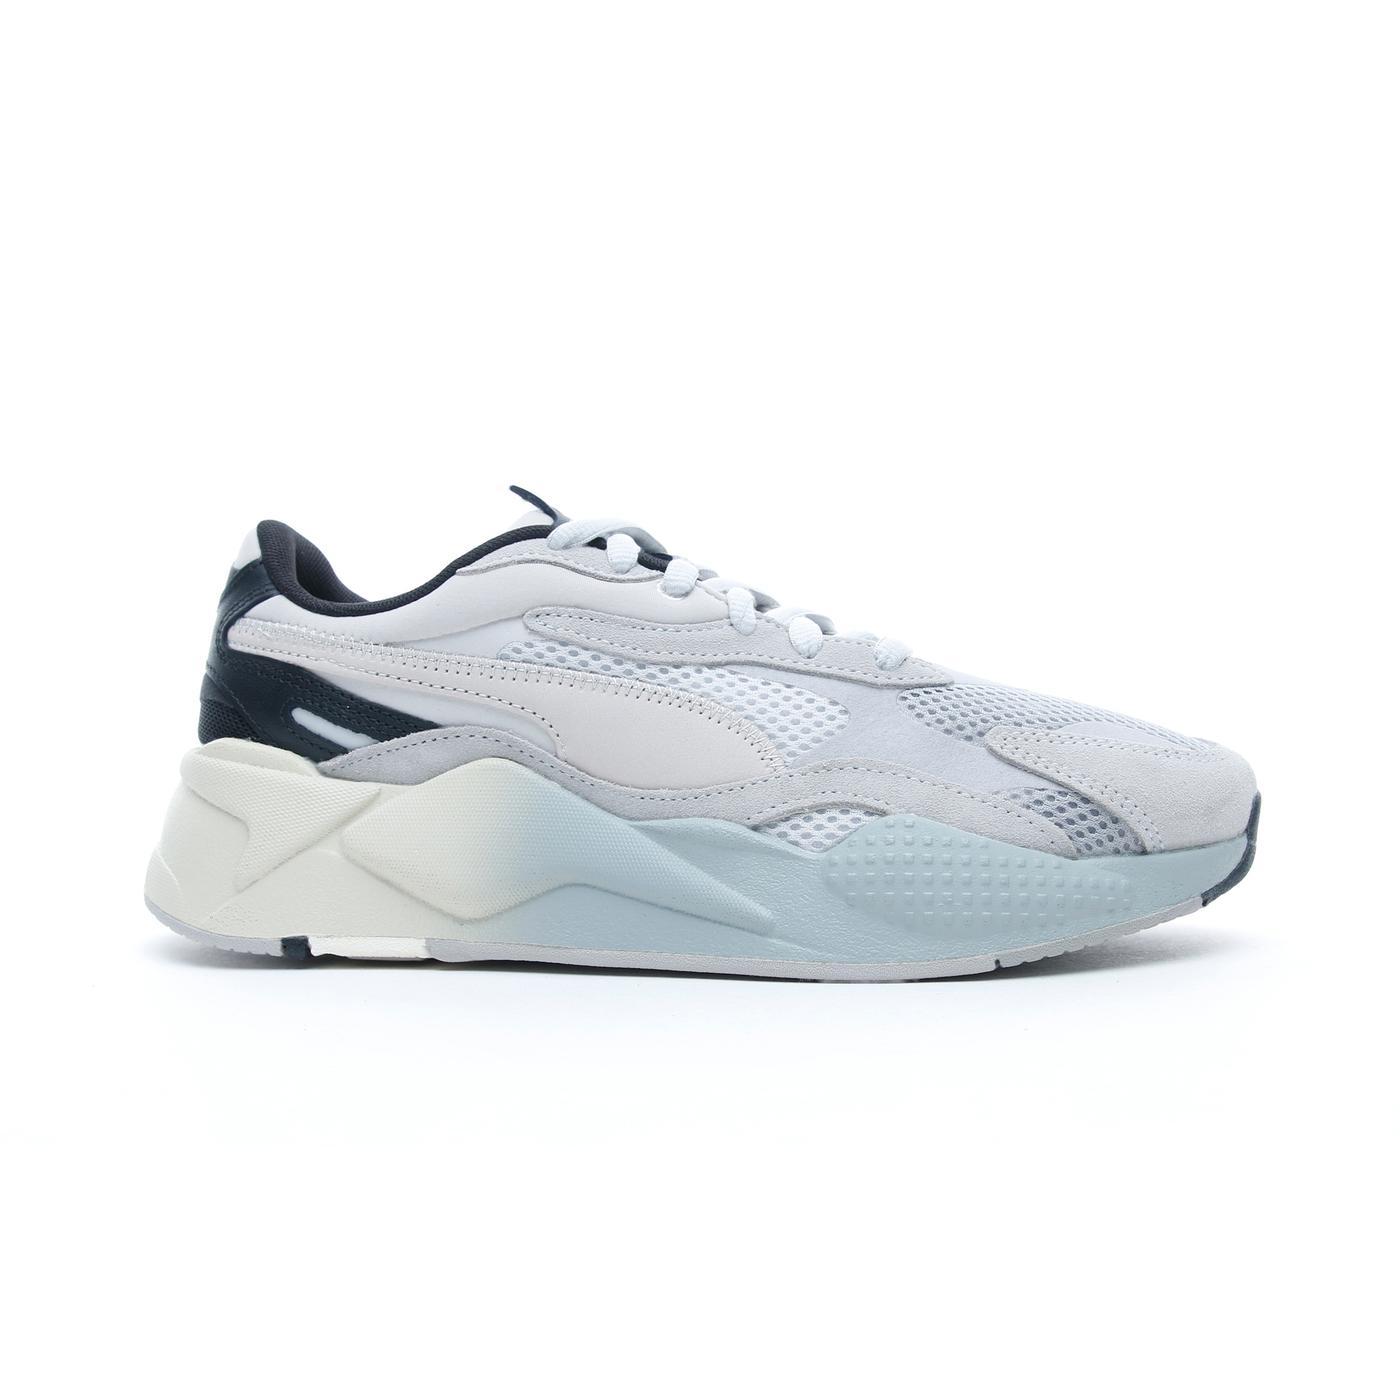 Puma RS-X³ Move Erkek Gri Spor Ayakkabı